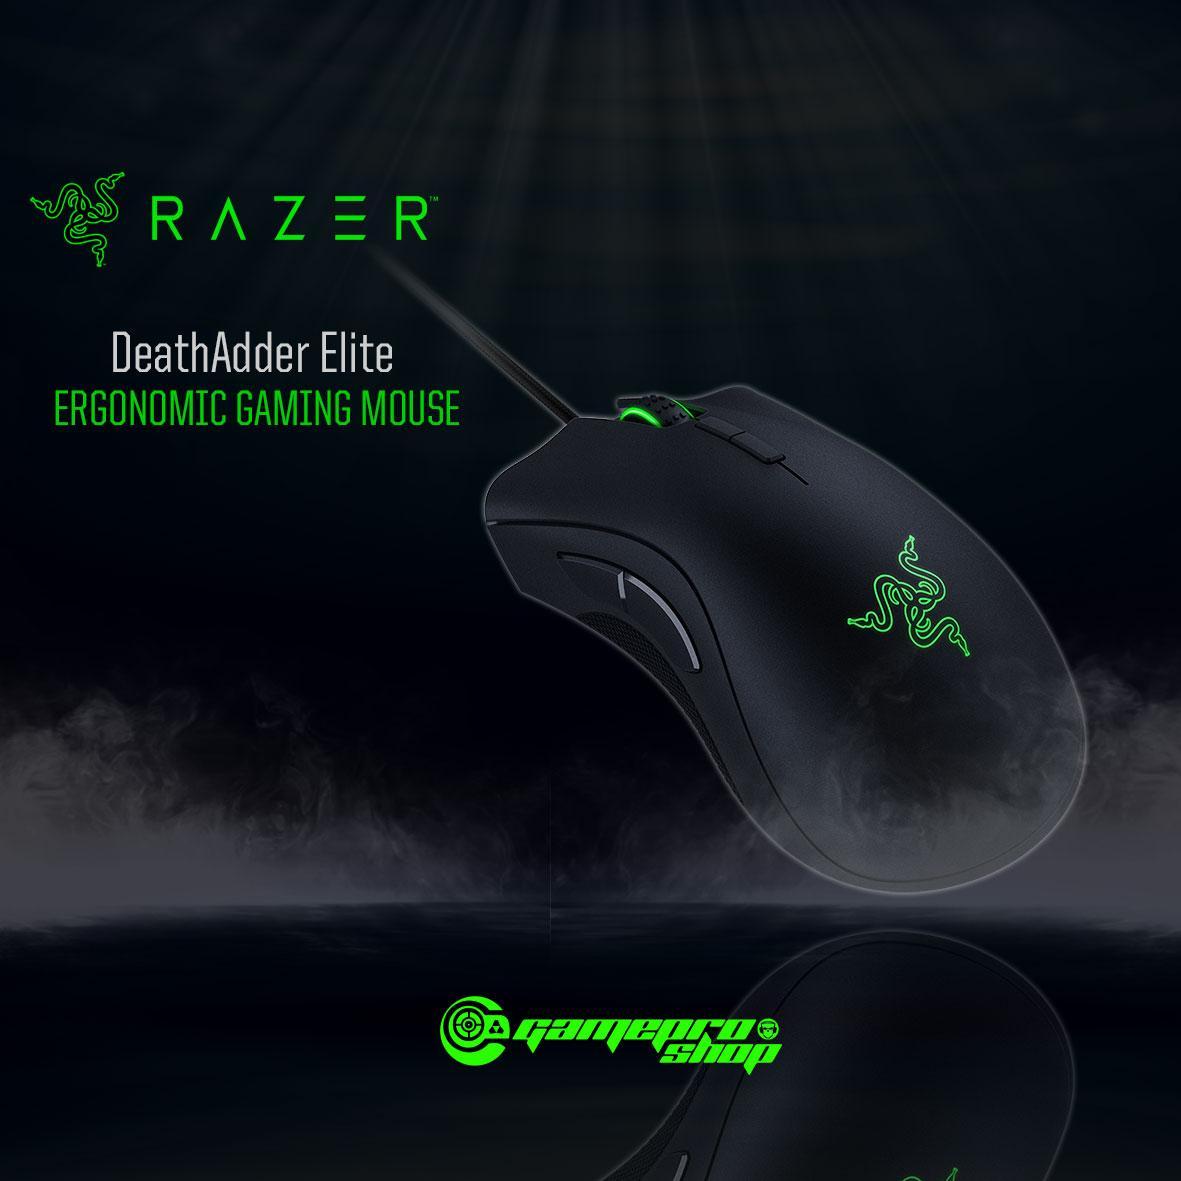 Store Razer Deathadder Elite Ergonomic Gaming Mouse Gss Promo Razer On Singapore